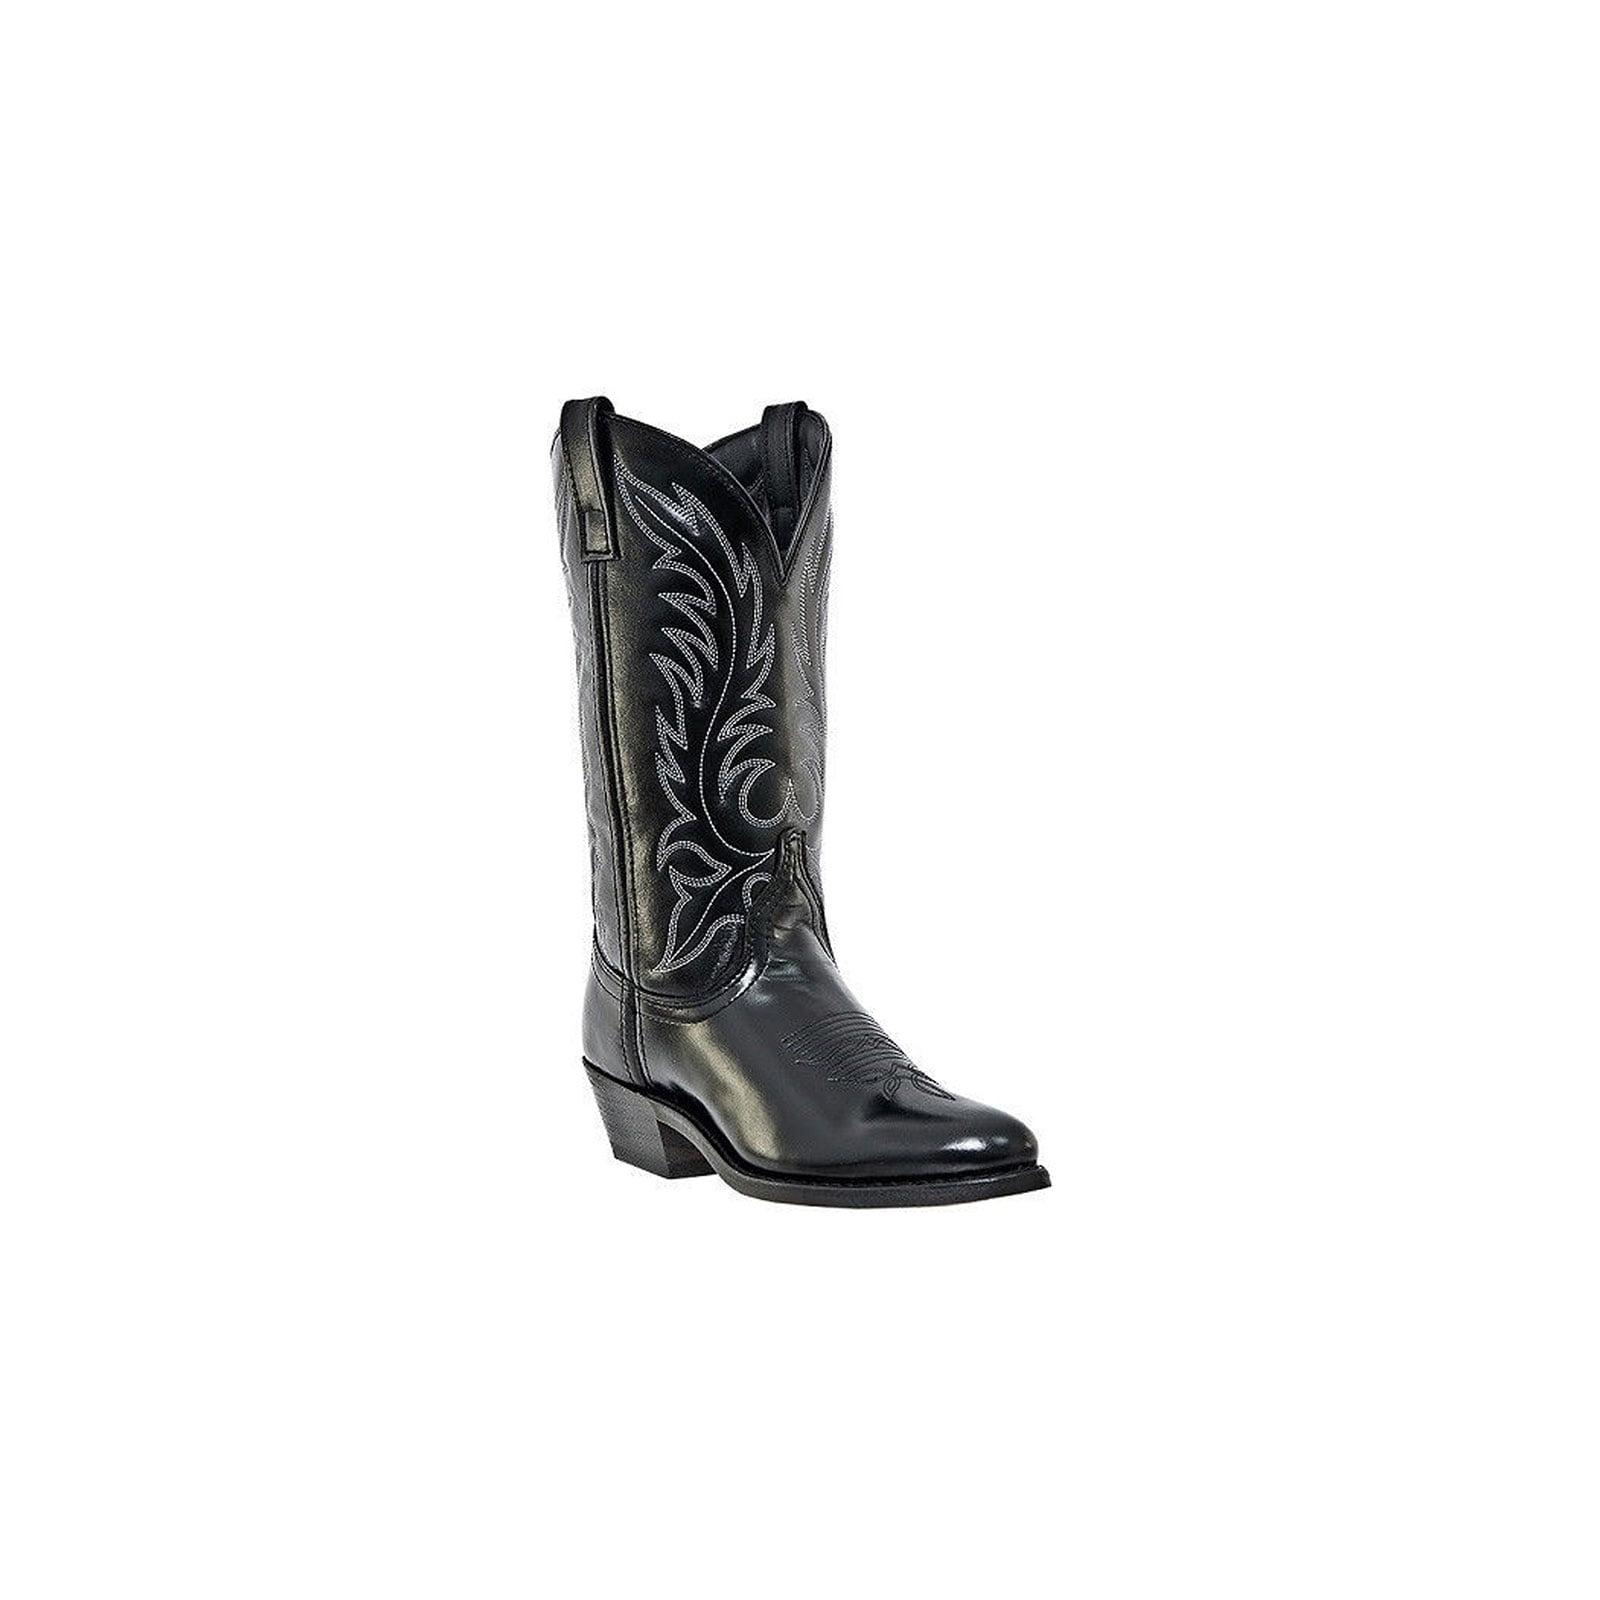 Laredo 5740 Women's Black Kadi Western Boots by Laredo